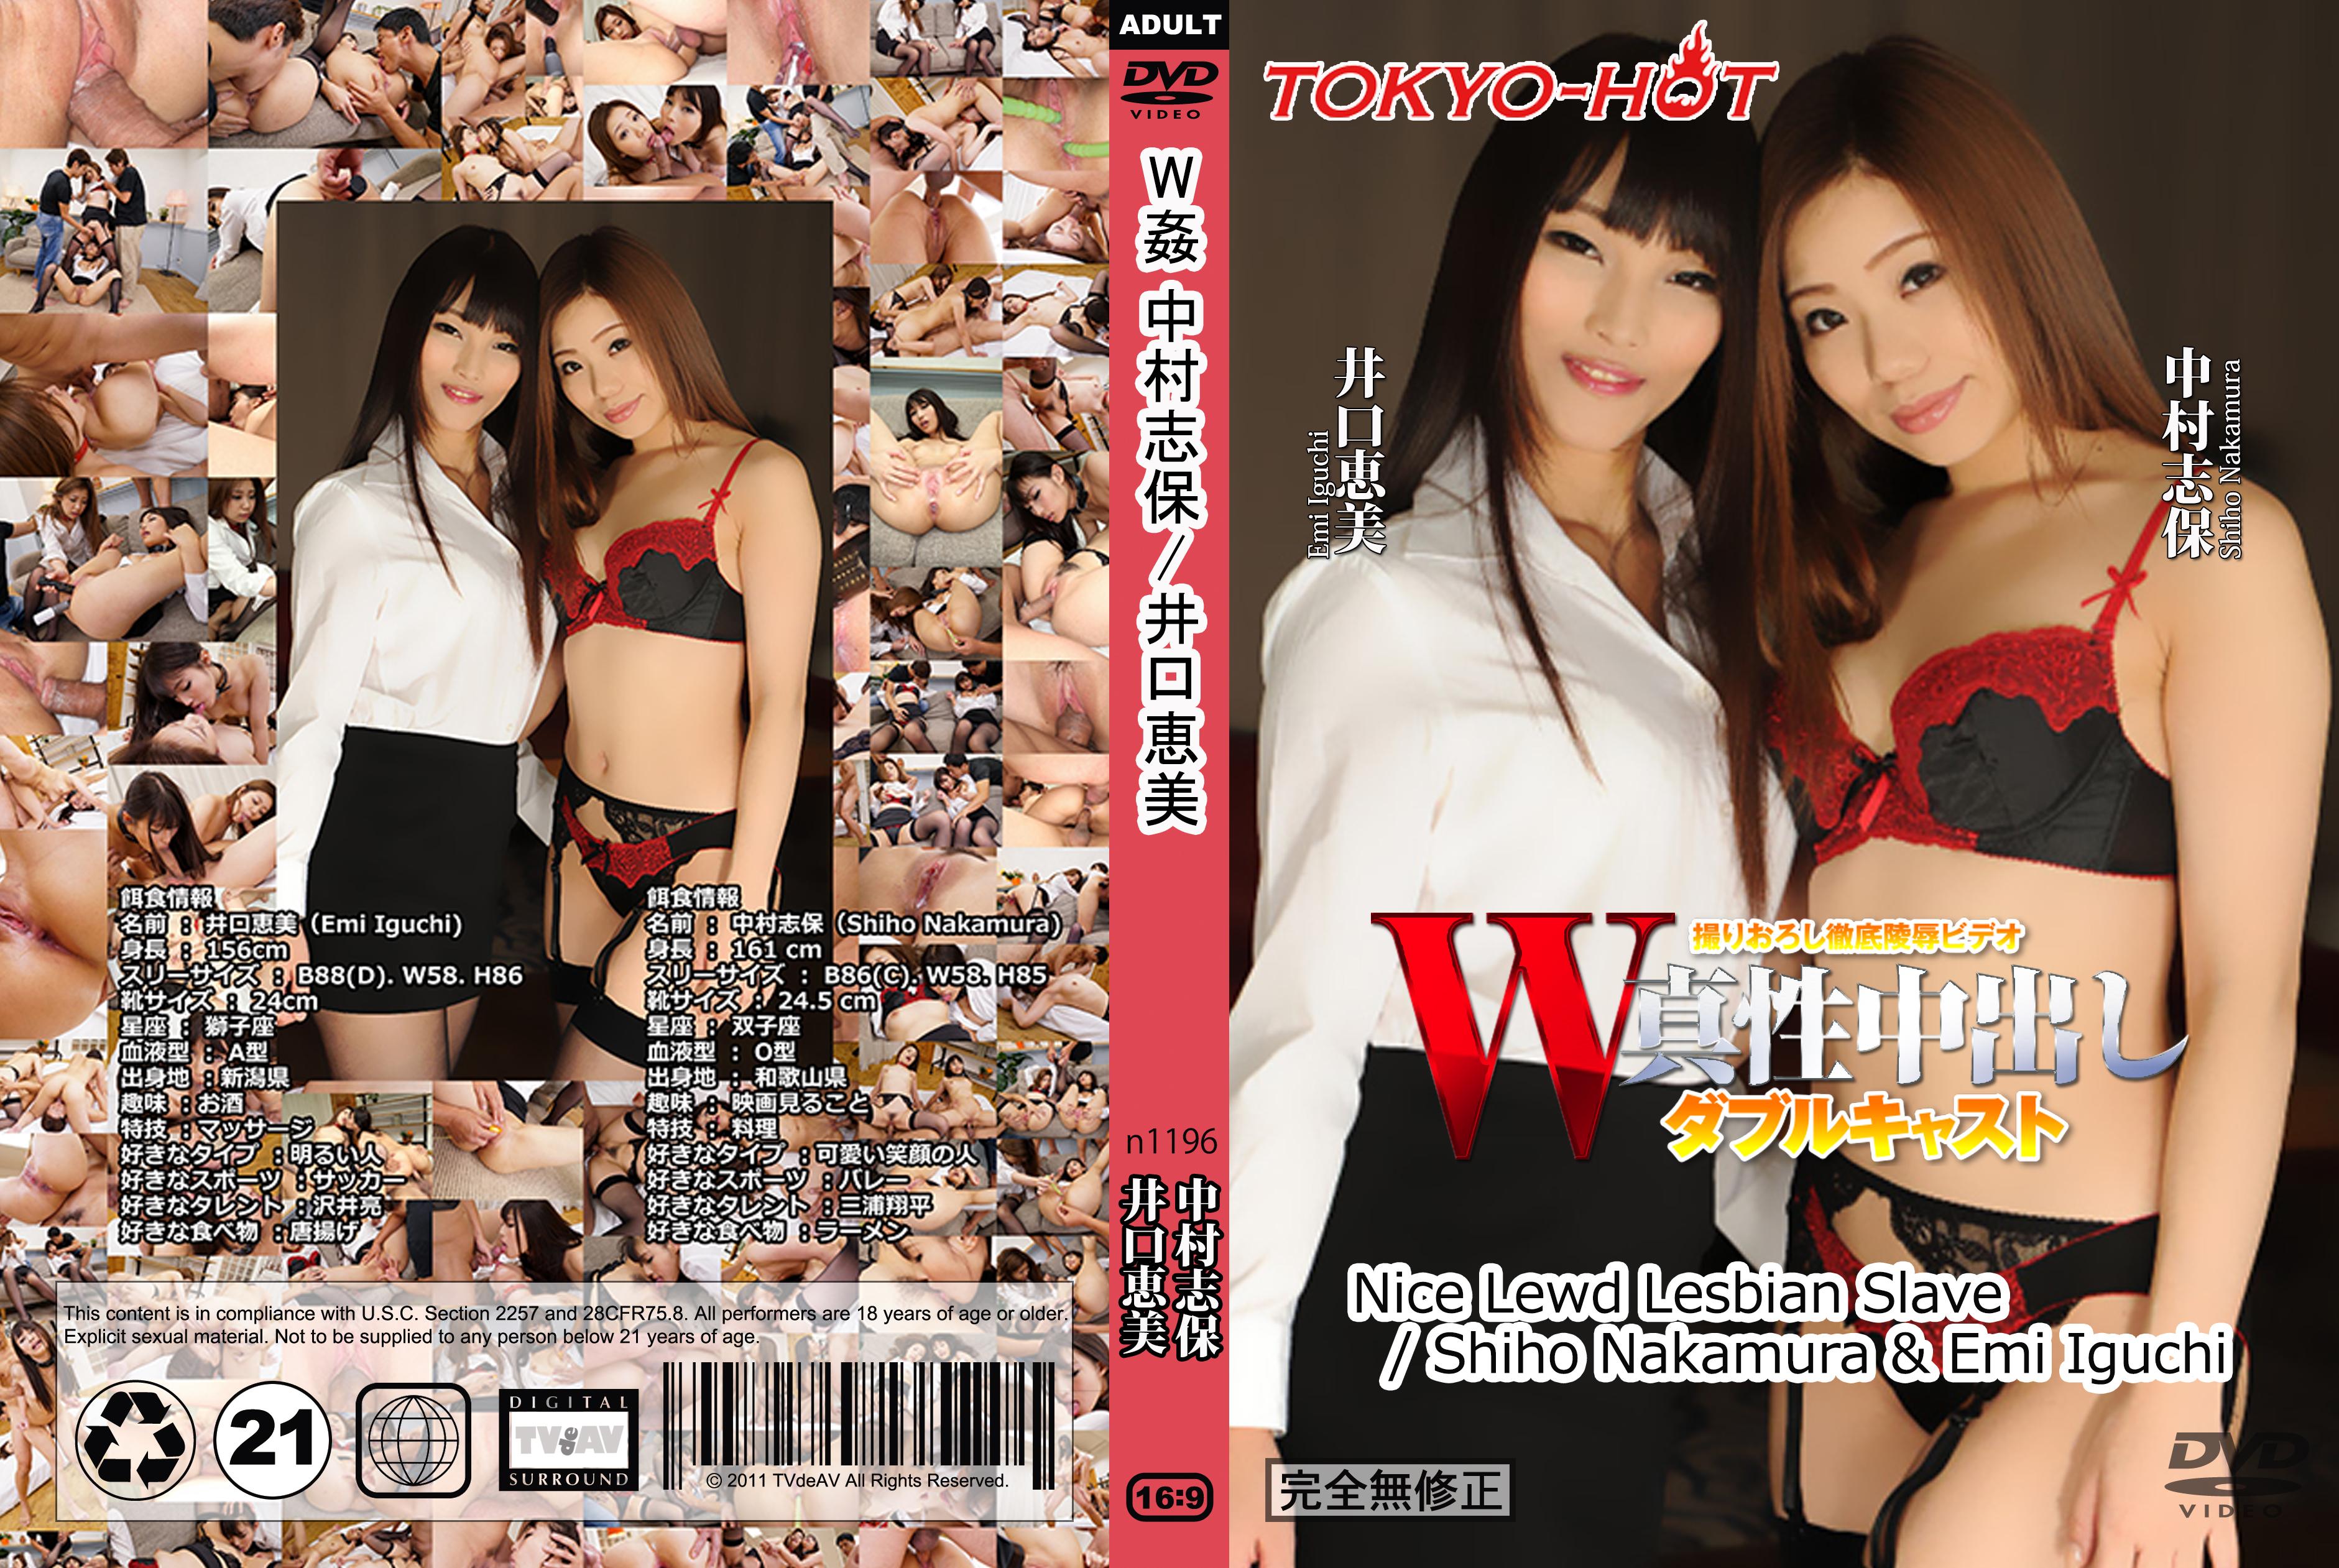 http://my.cdn.tokyo-hot.com/media/n1196/jacket/n1196.jpg